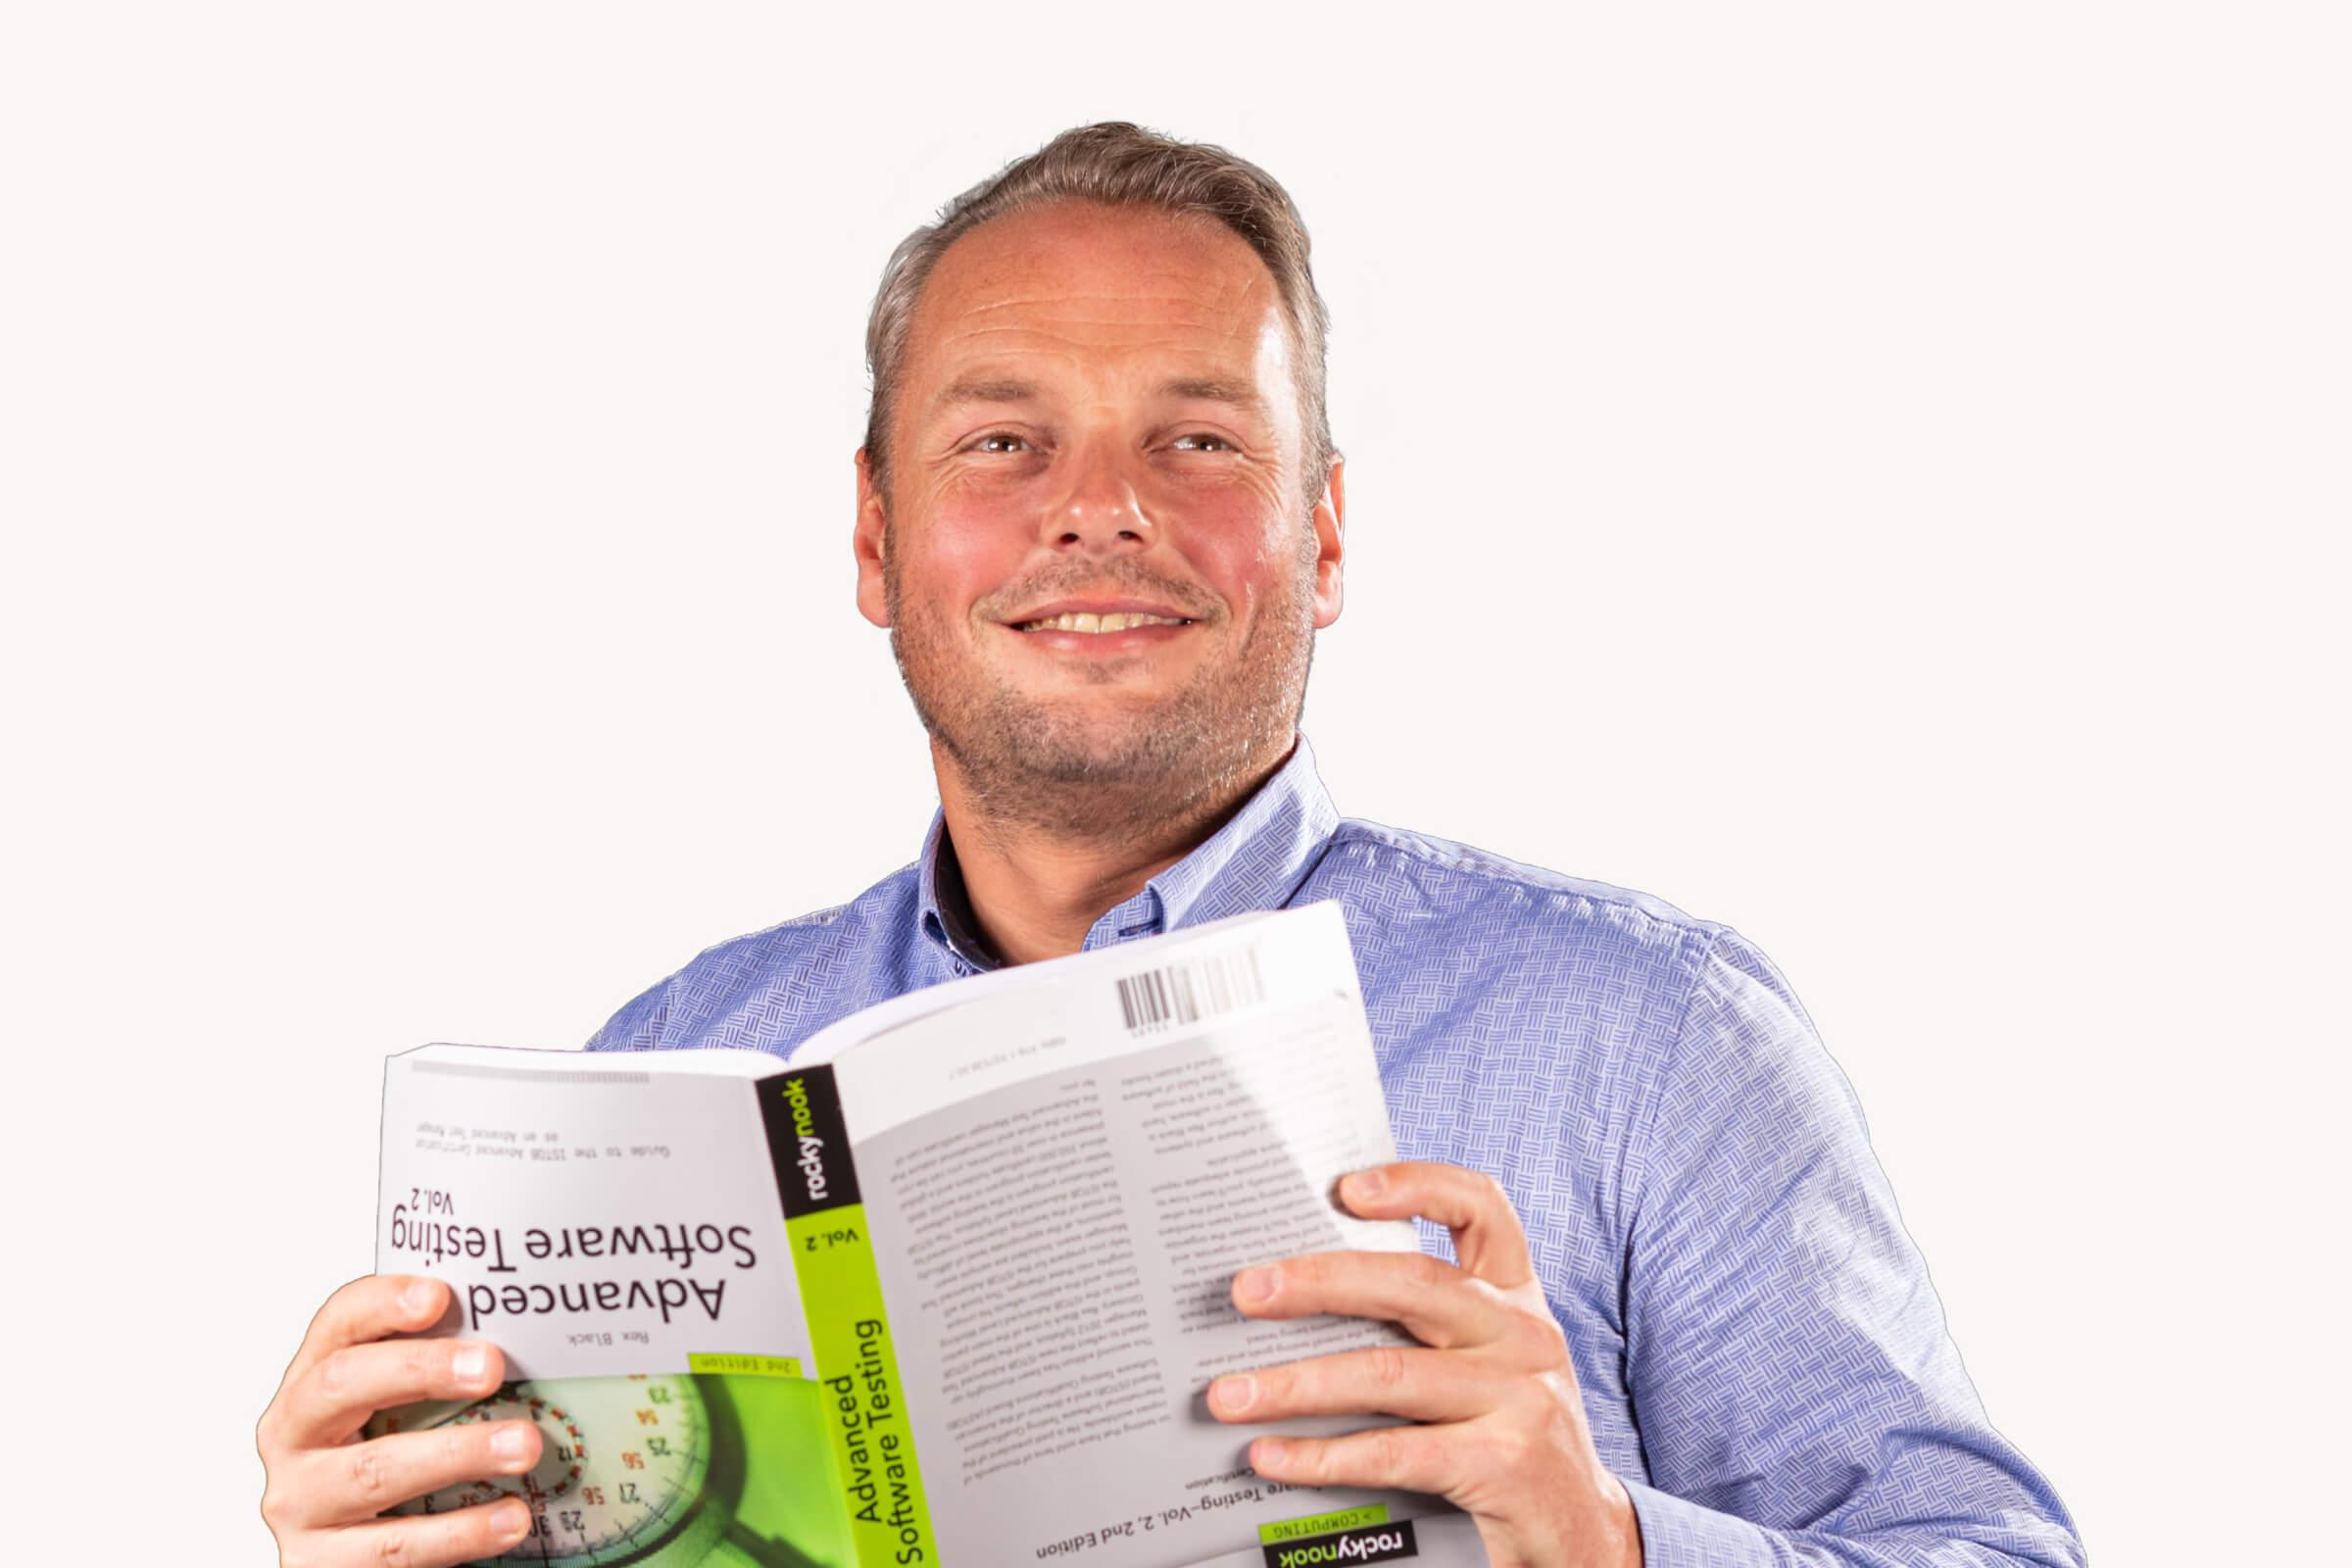 Mattijs de test expert van Concept7